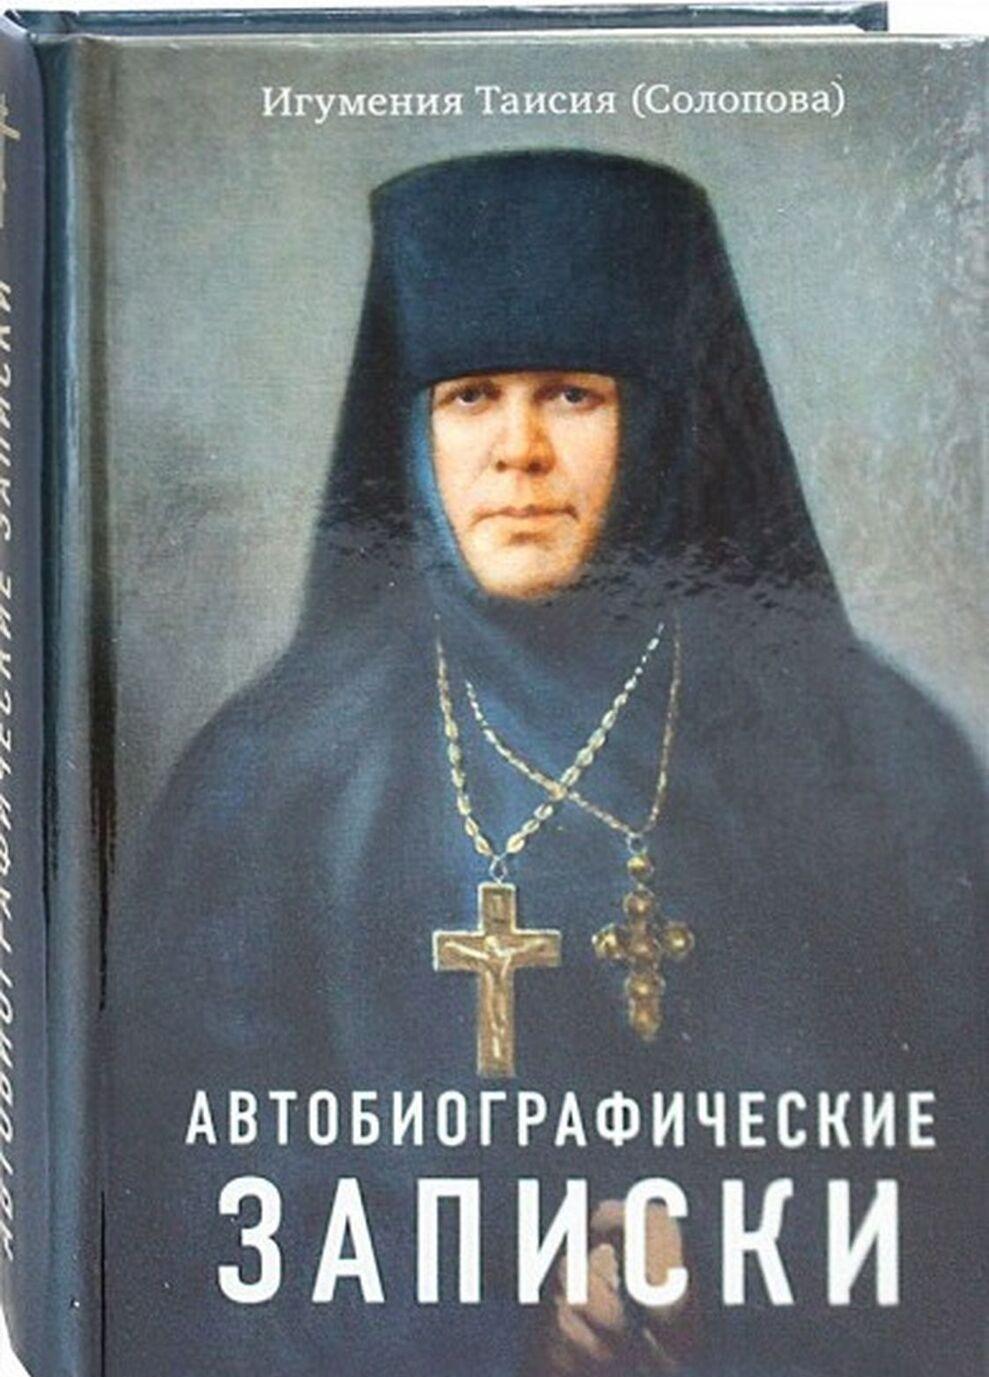 Igumenija Taisija (Solopova). Avtobiograficheskie zapiski | Igumenija Taisija (Solopova)